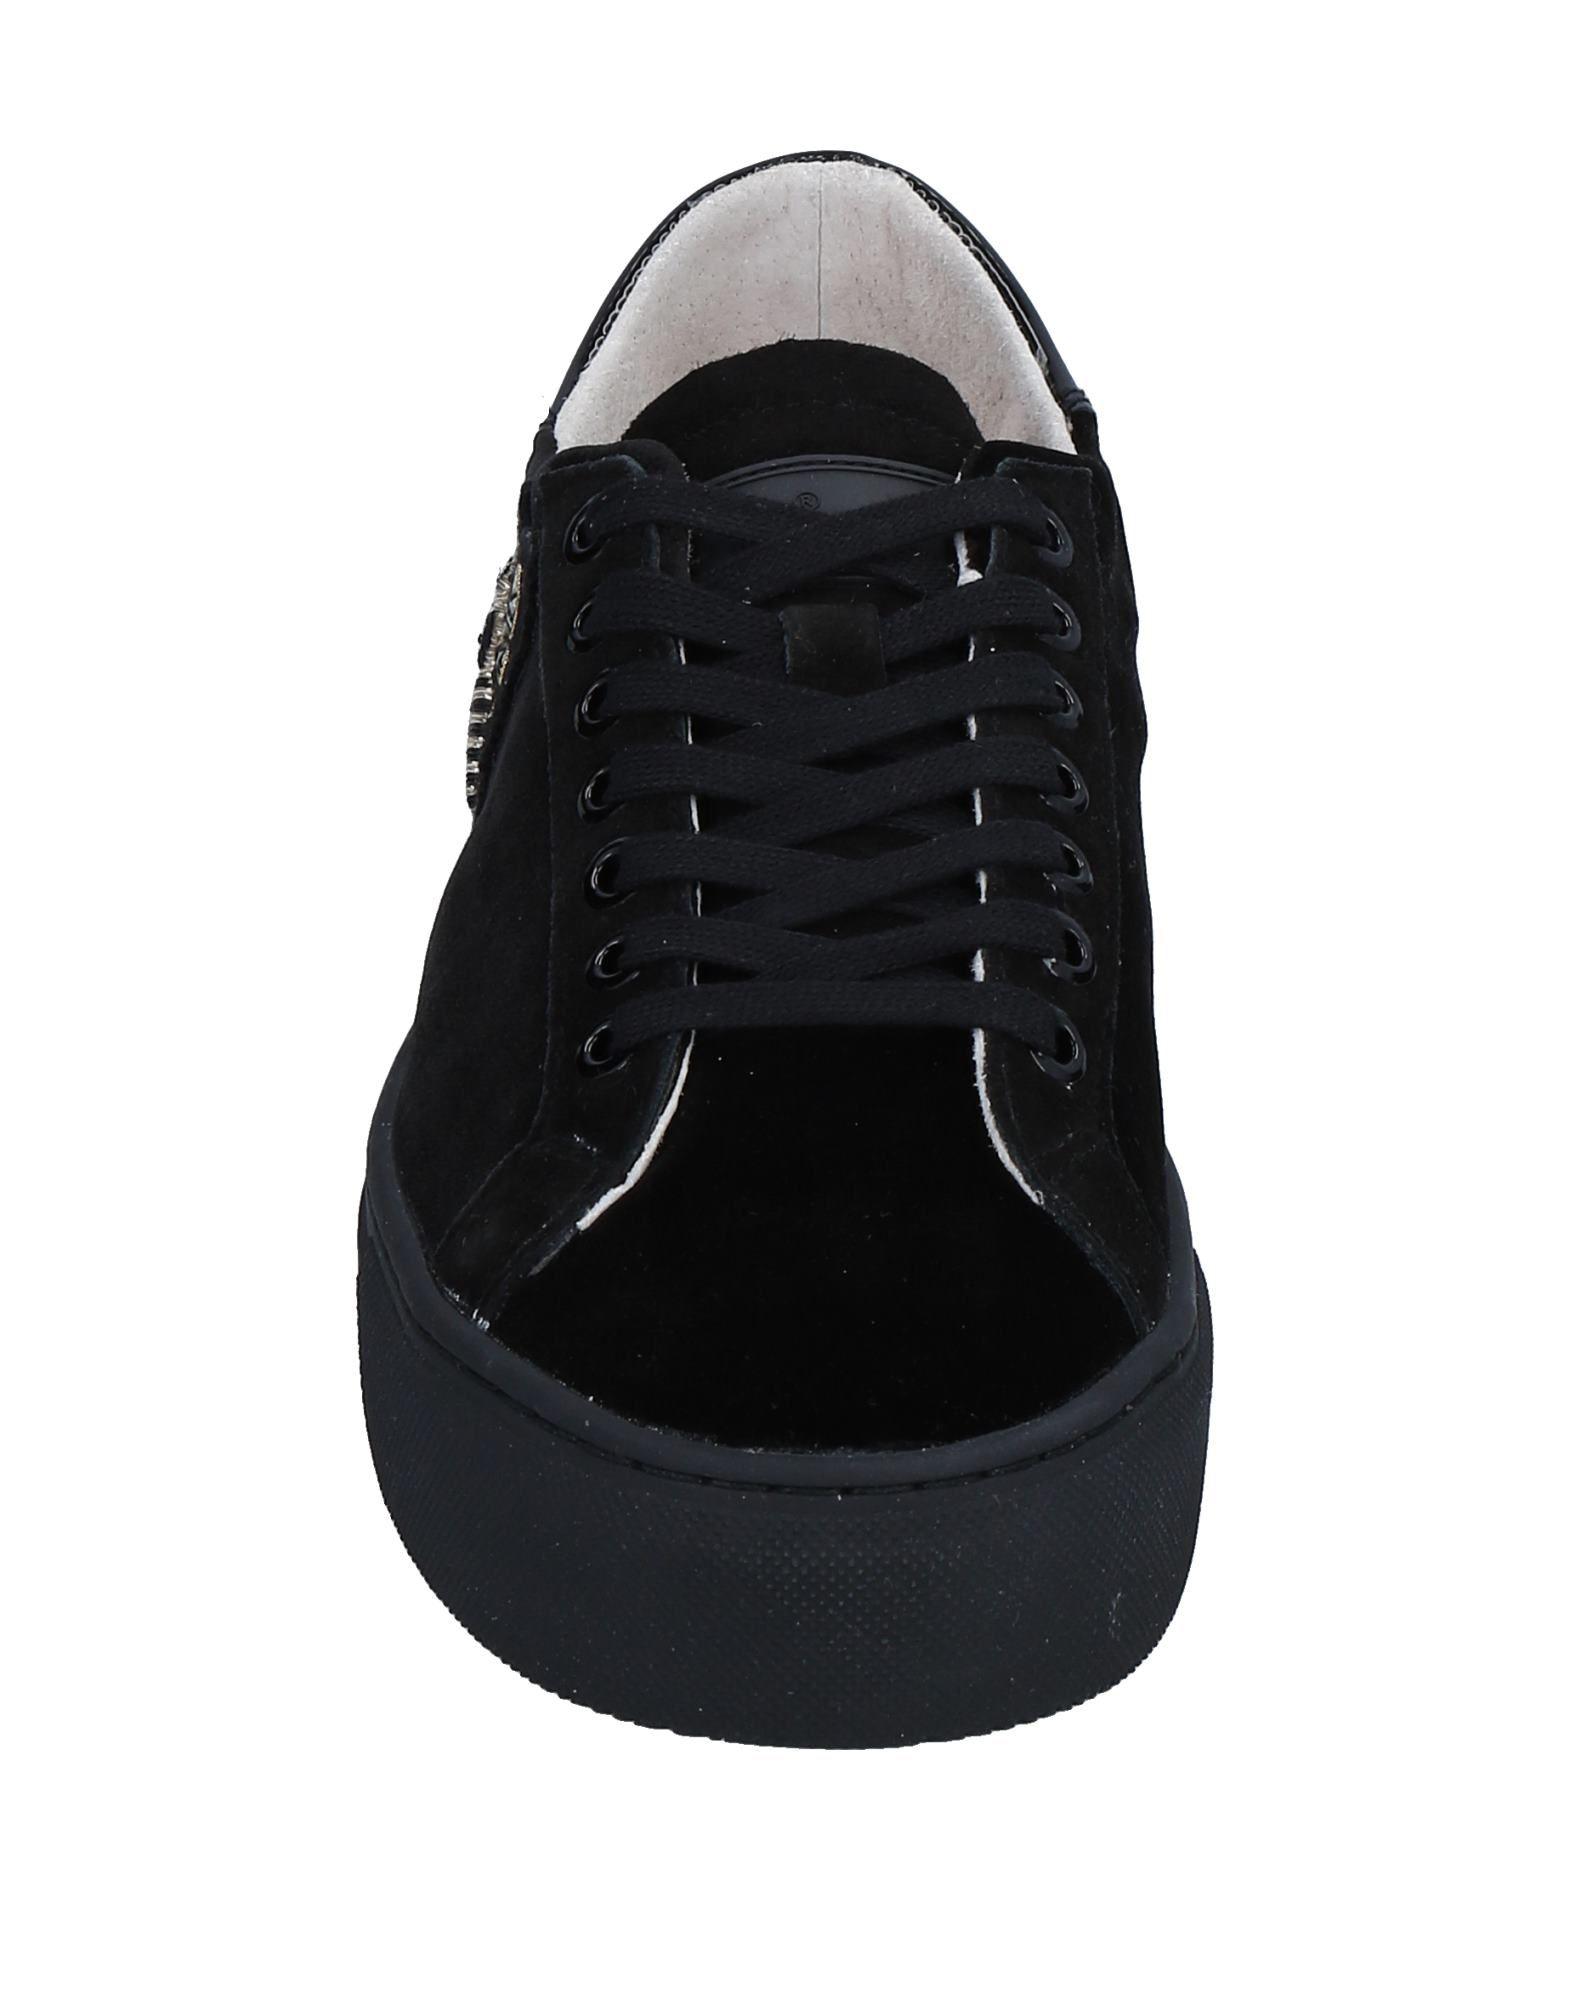 Stilvolle billige Schuhe 11518525OJ D.A.T.E. Sneakers Damen  11518525OJ Schuhe bfc59f